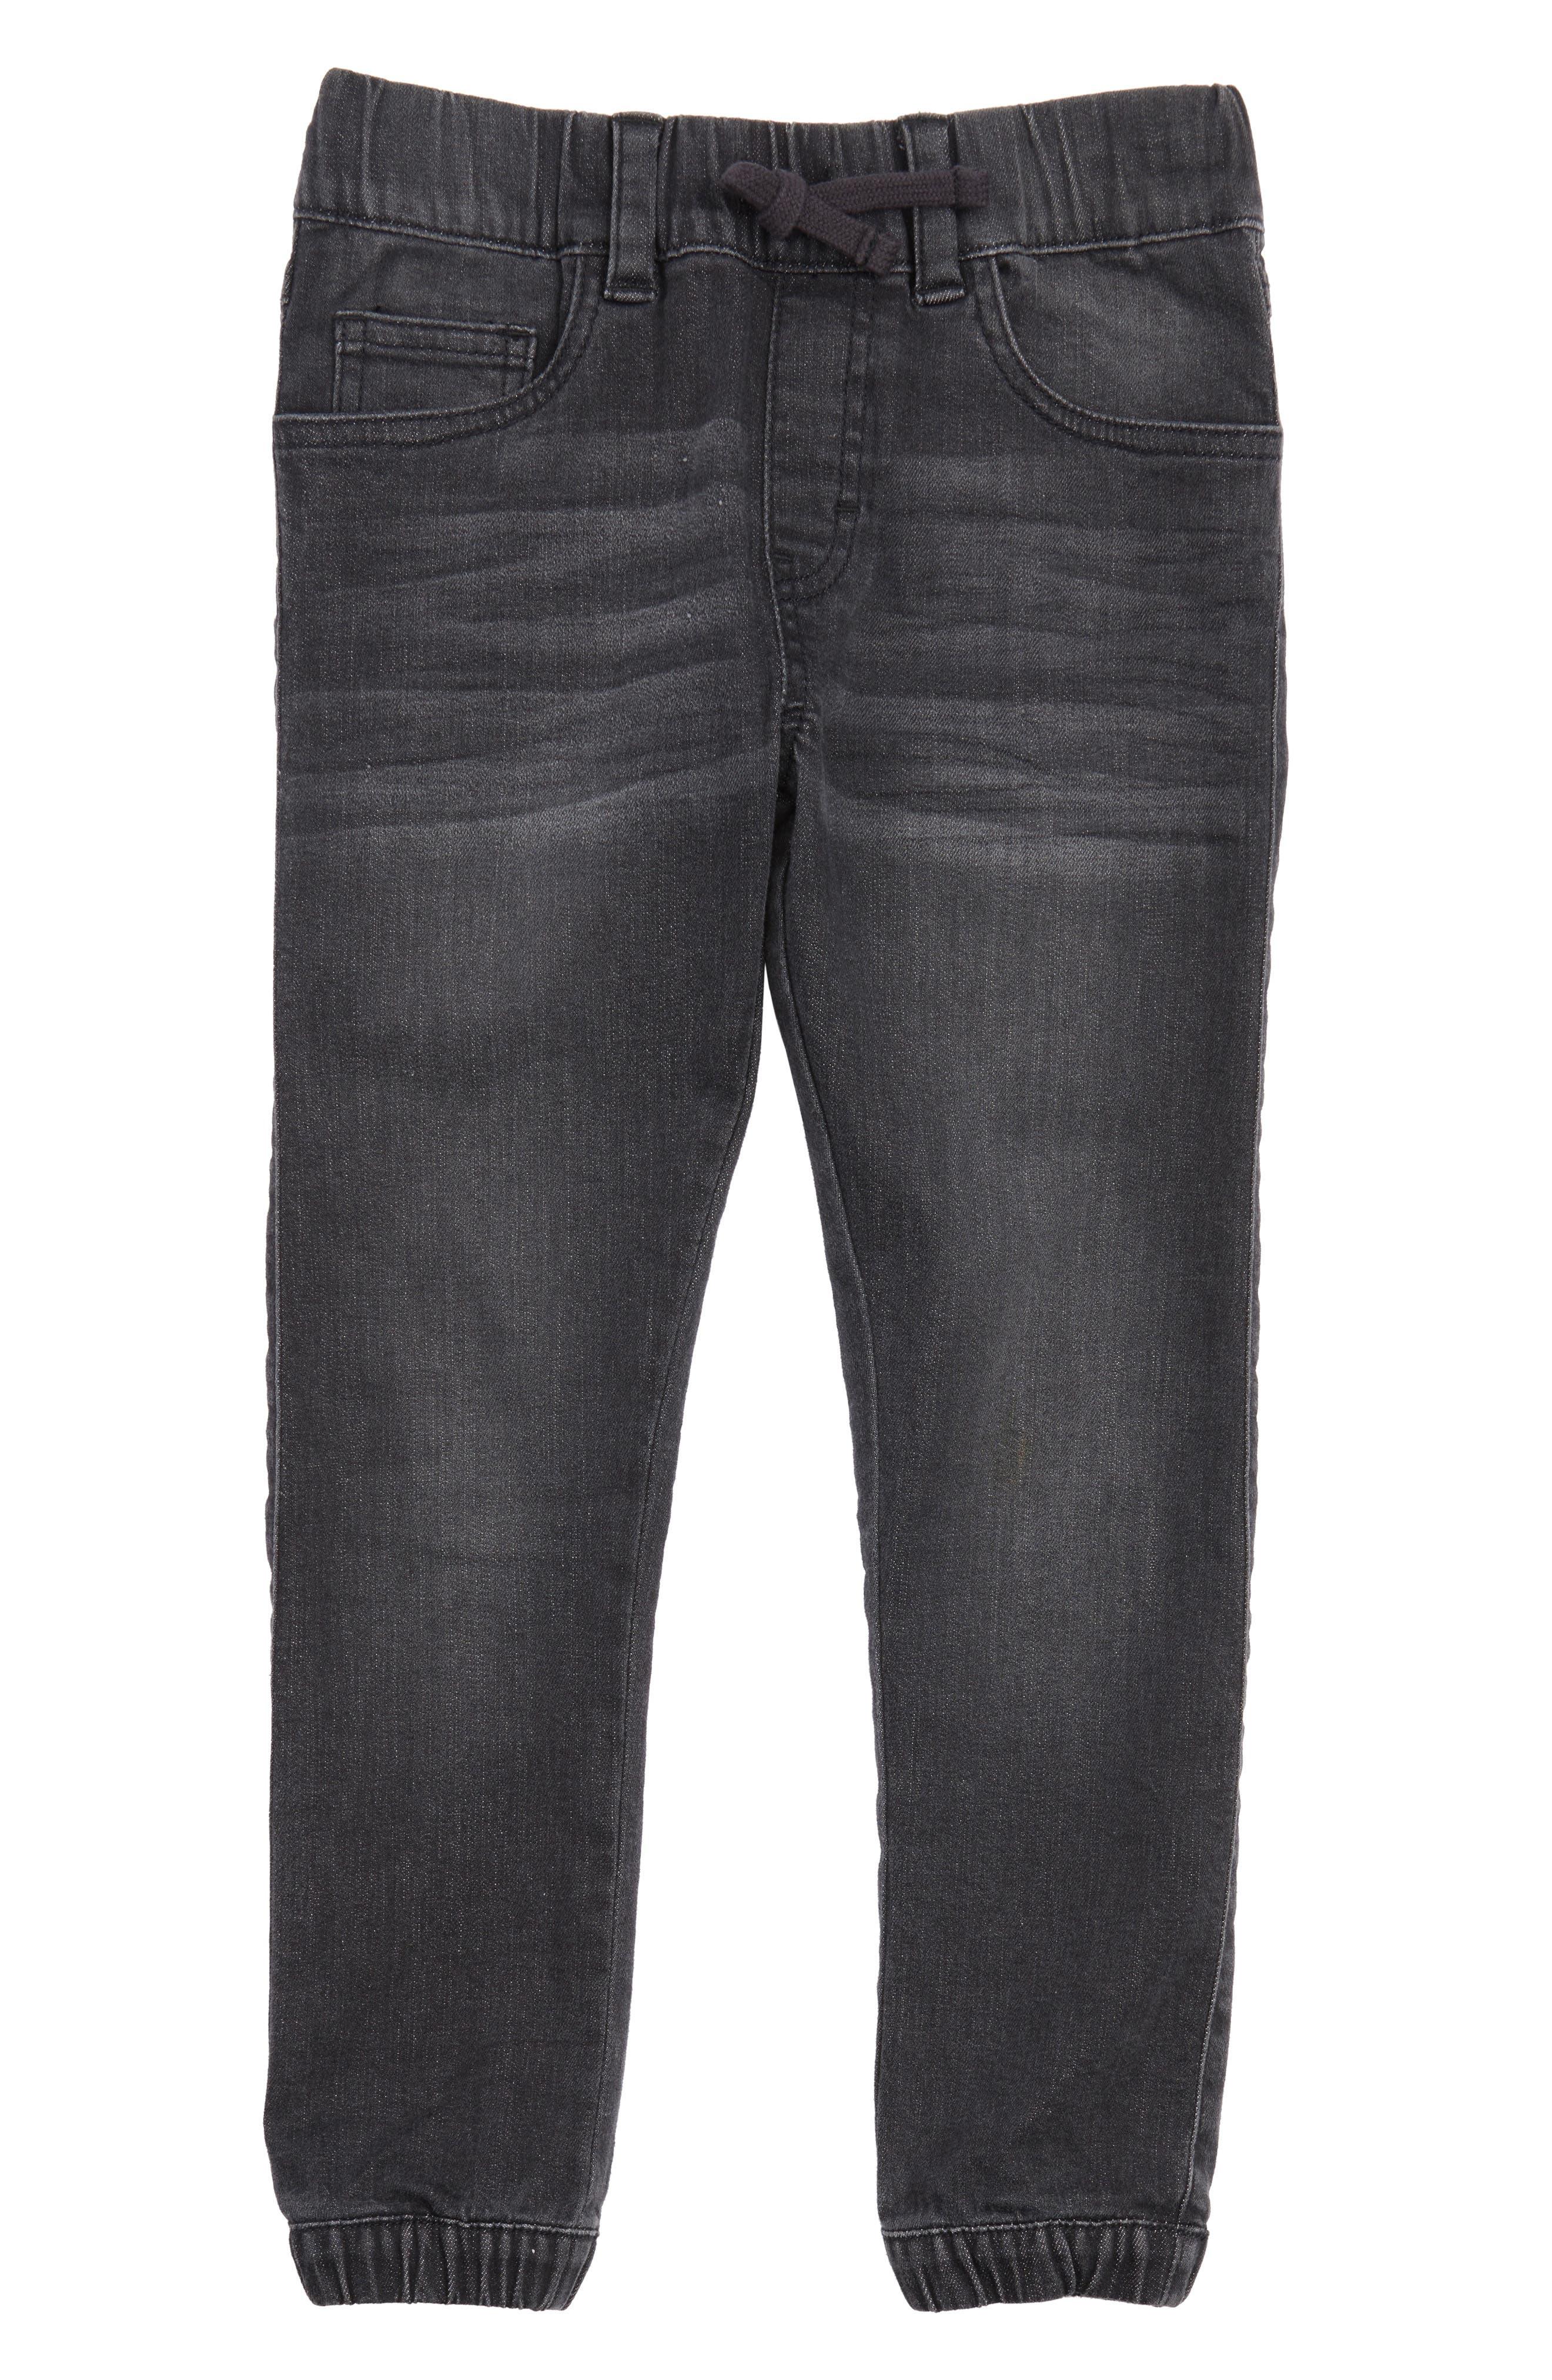 Denim Jogger Pants,                         Main,                         color, 001